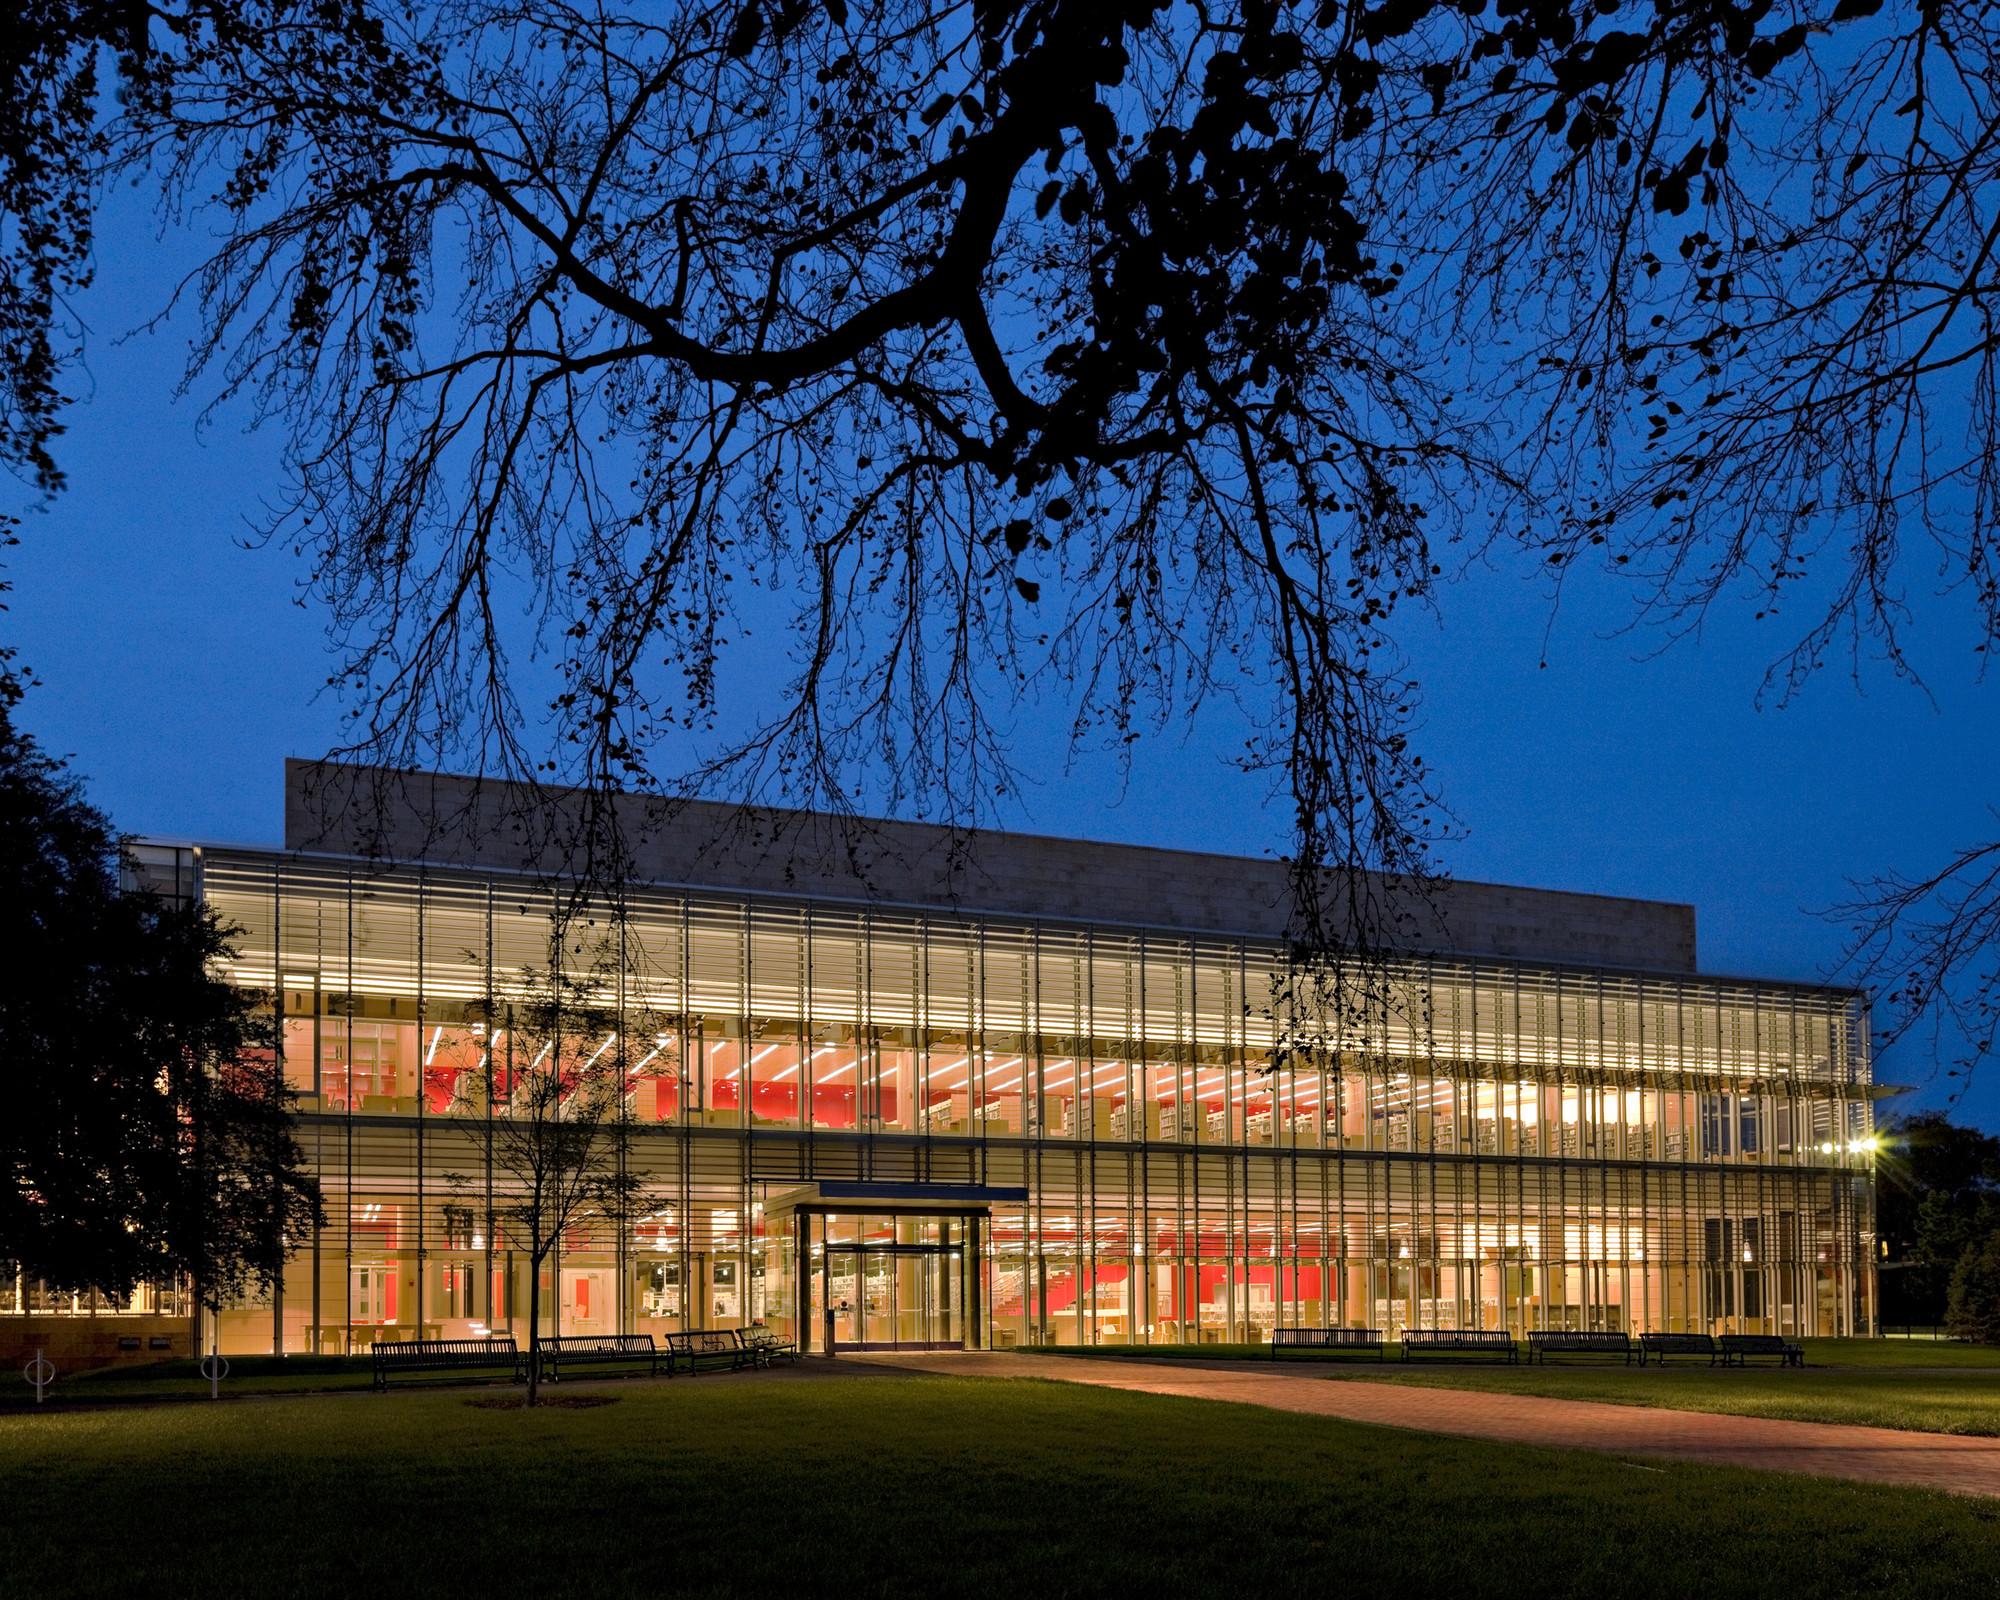 Pr mio de honra aia 2015 para arquitetura archdaily brasil for Cambridge architecture